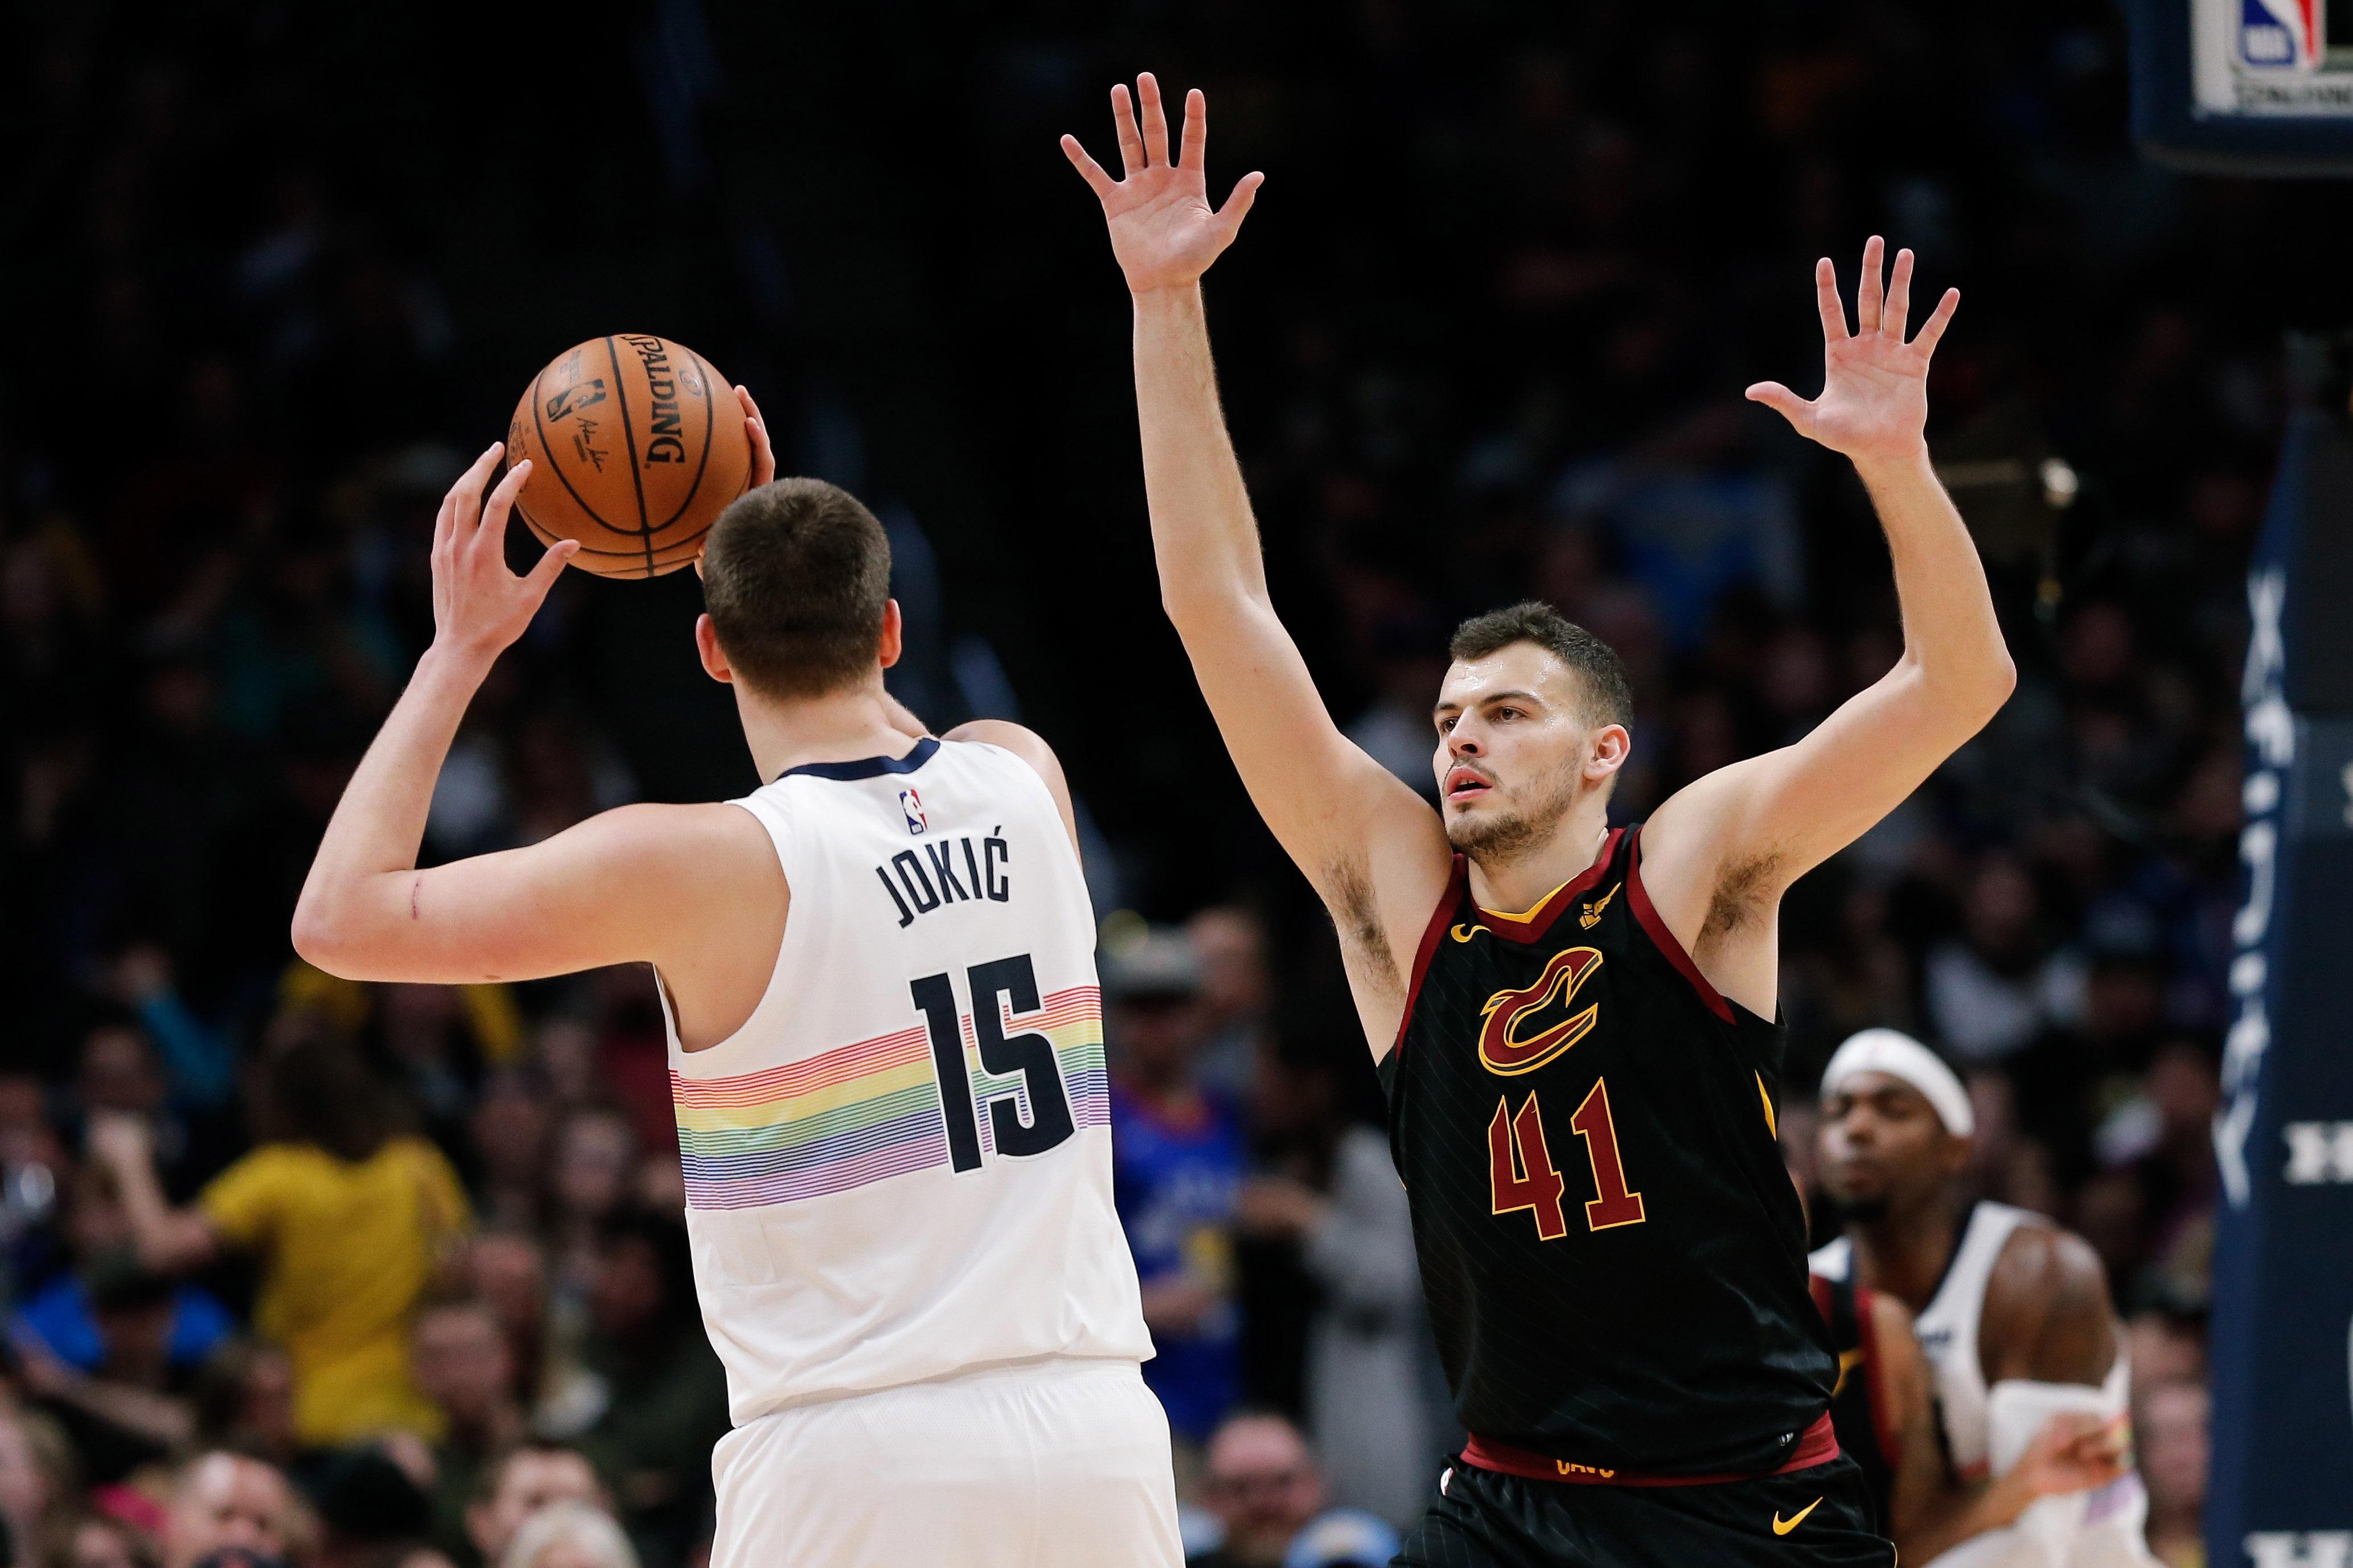 Cleveland Cavaliers center Ante Zizic (41) guards Denver Nuggets center Nikola Jokic (15) in the second quarter at the Pepsi Center.